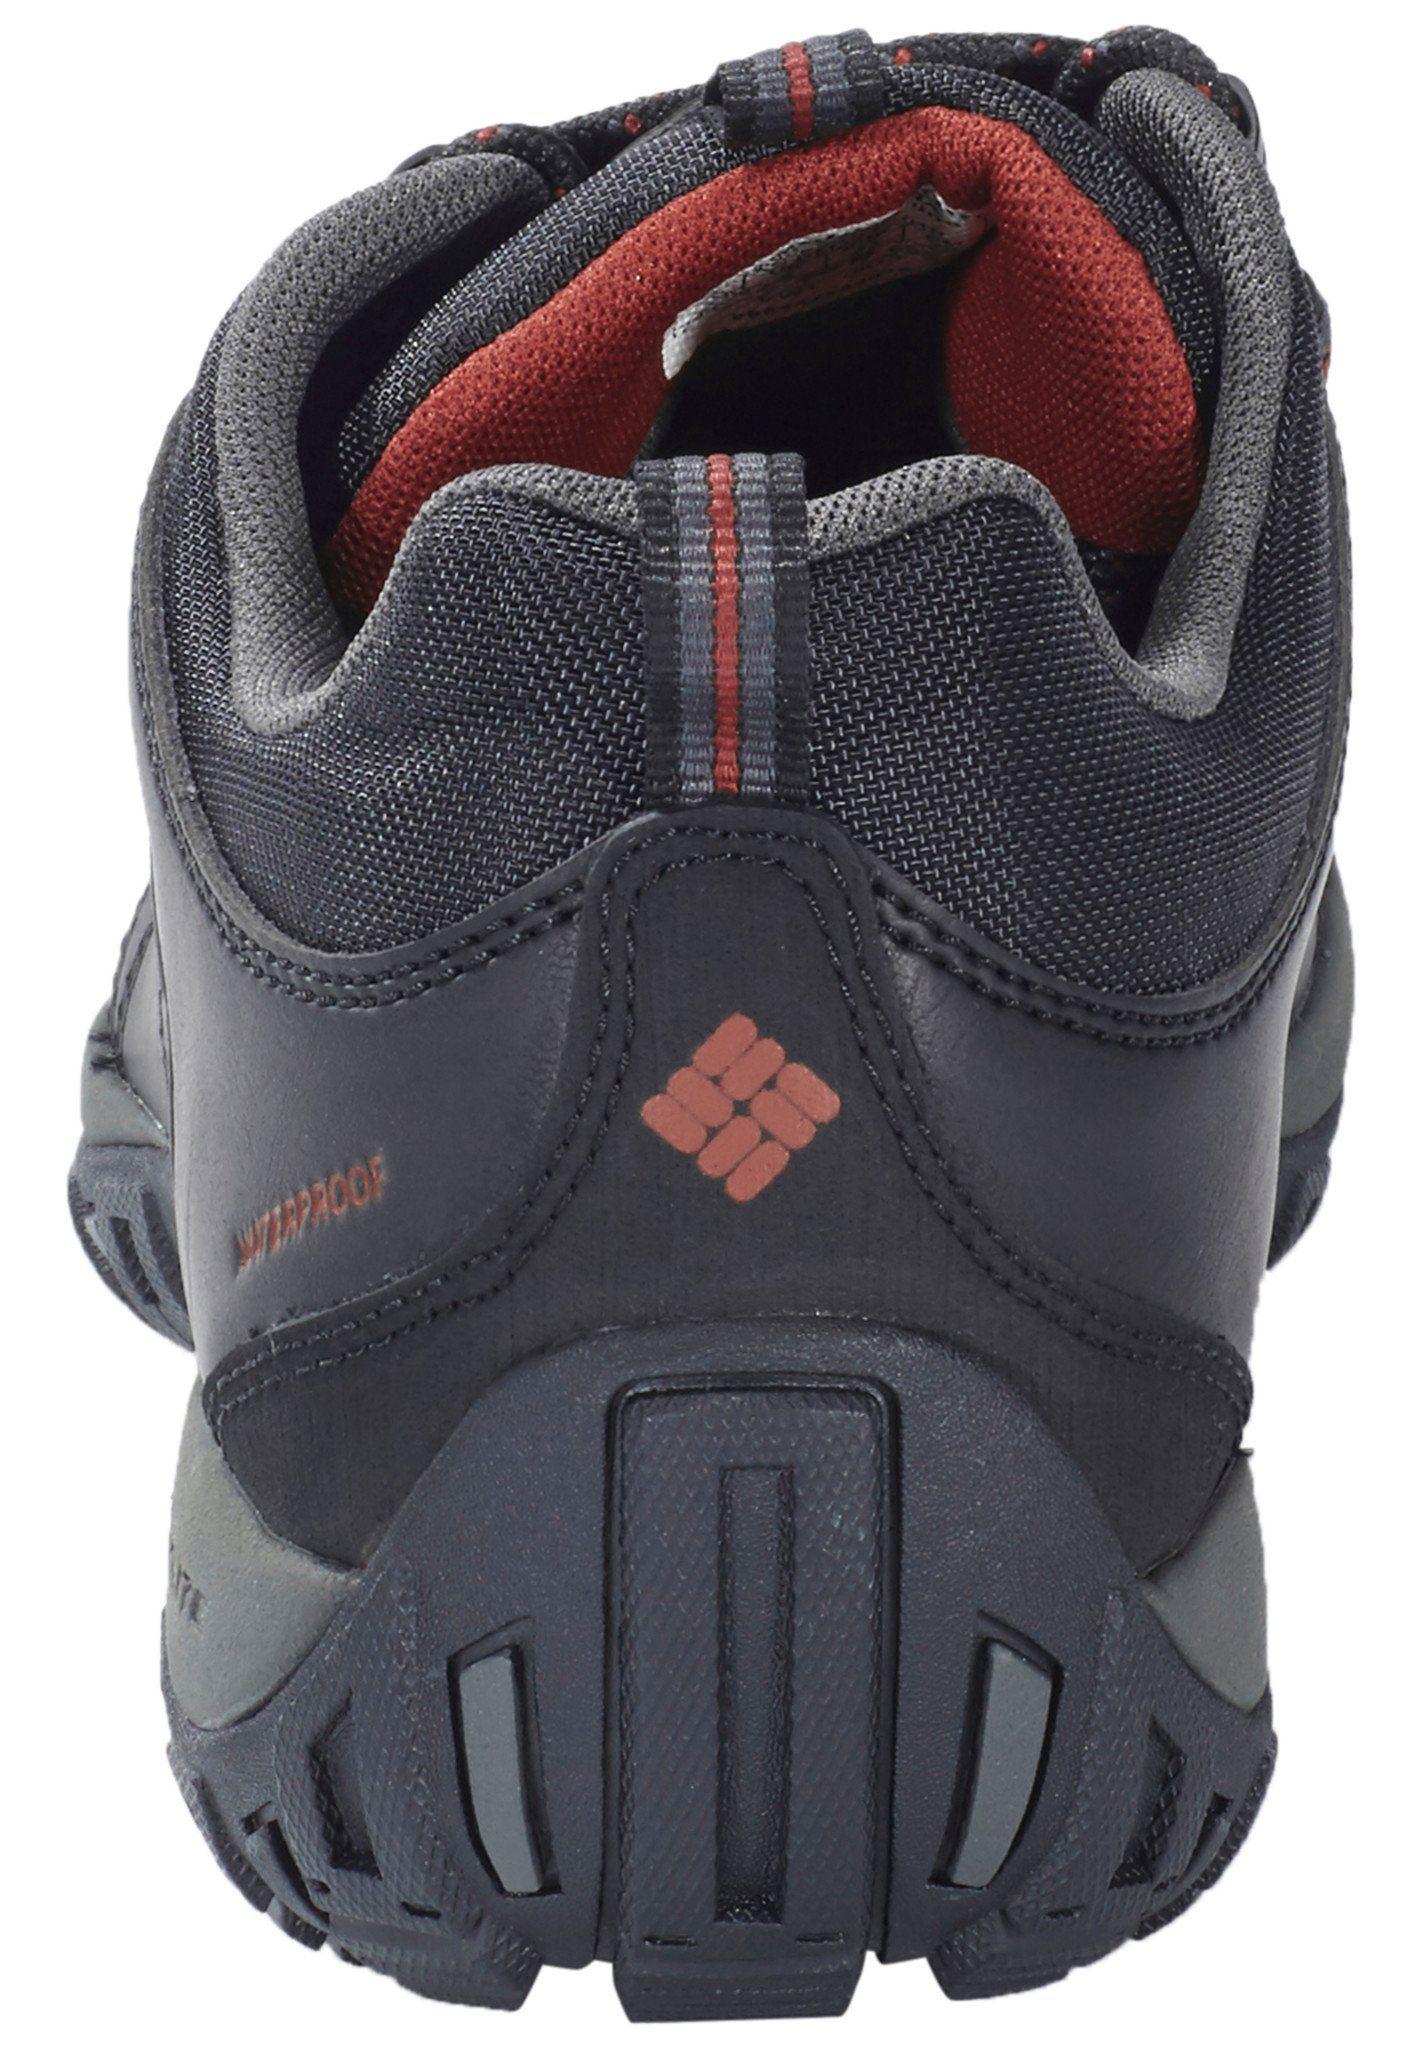 Columbia Kletterschuh Peakfreak Venture Shoes Men WP online kaufen  grau